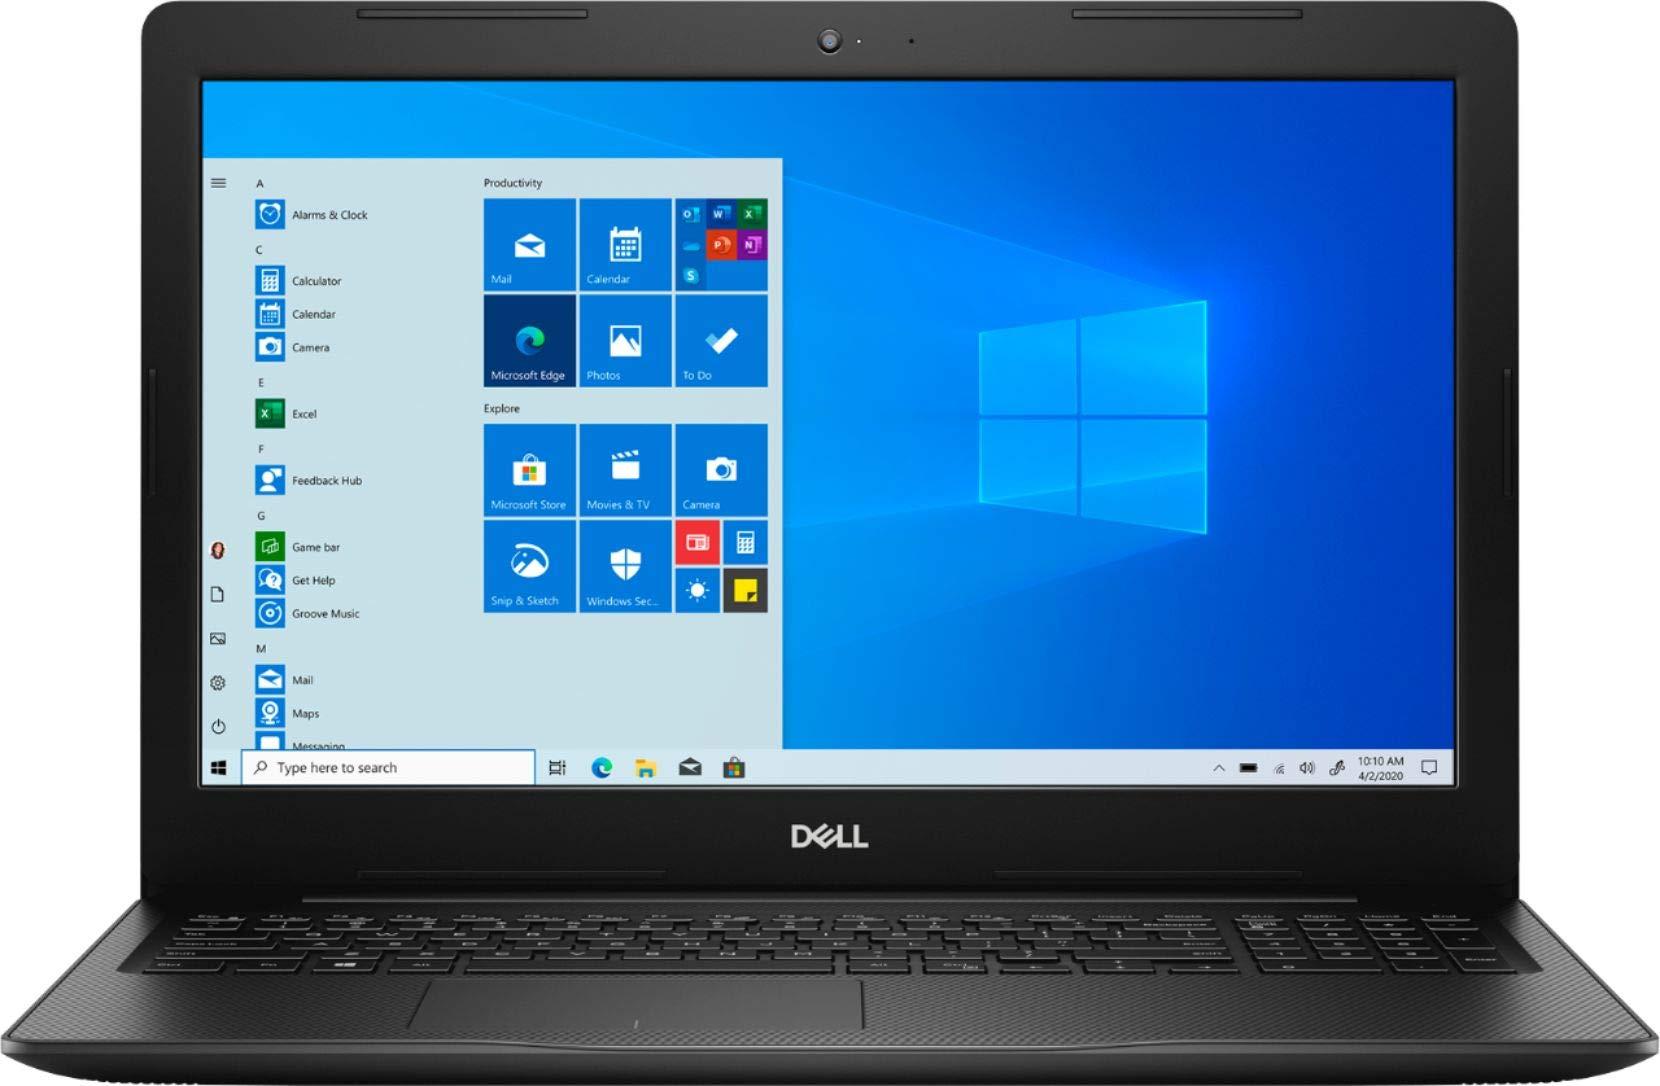 Newest Dell Inspiron 15.6 HD Touchscreen Premium Laptop | 10th Gen Intel Quad-Core i7-1065G7 | 16GB RAM | 1TB SSD | Card Reader | HDMI | Windows 10 in S Mode